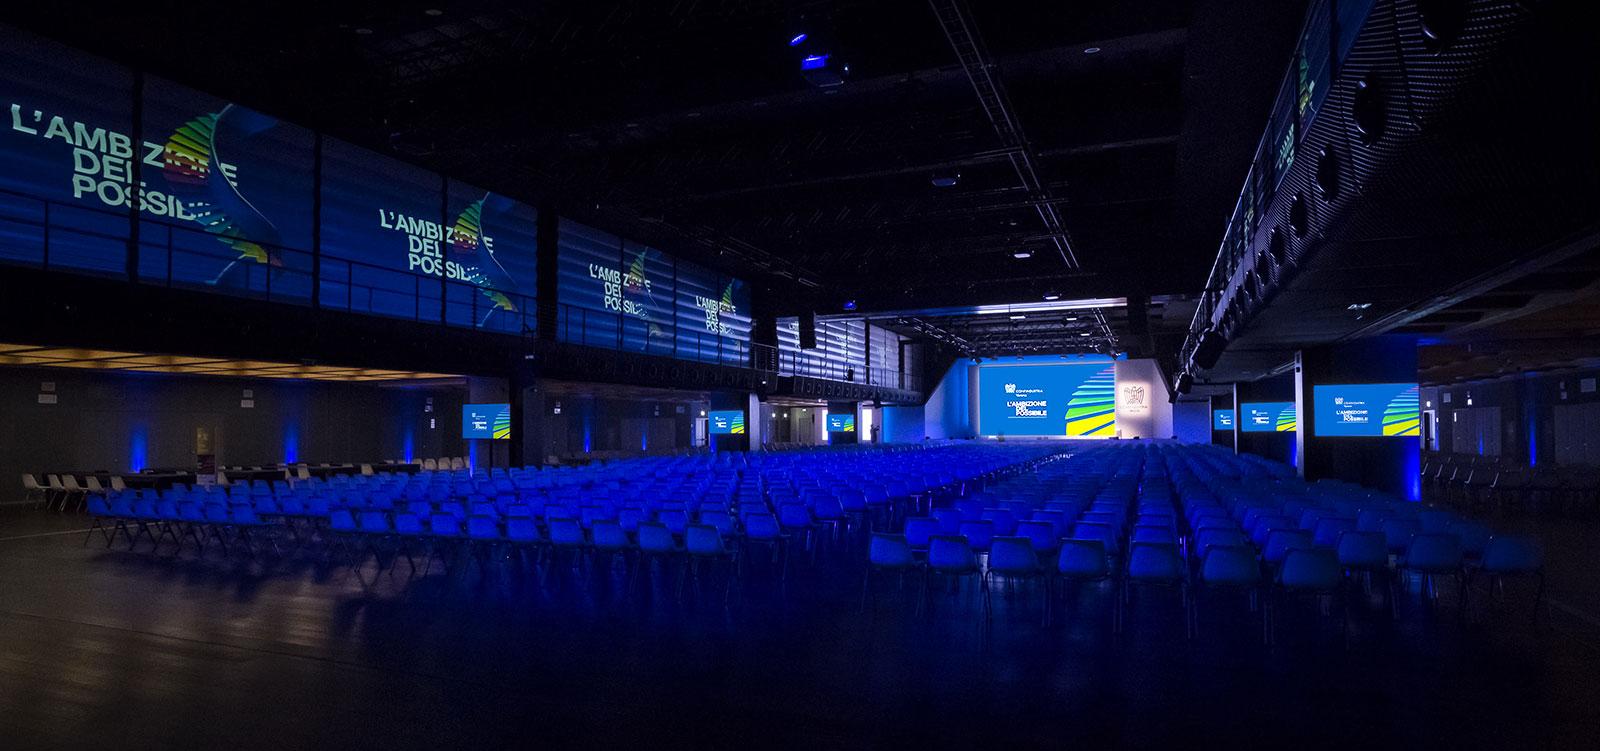 Confindustria Verona – Assemblea Generale 2019